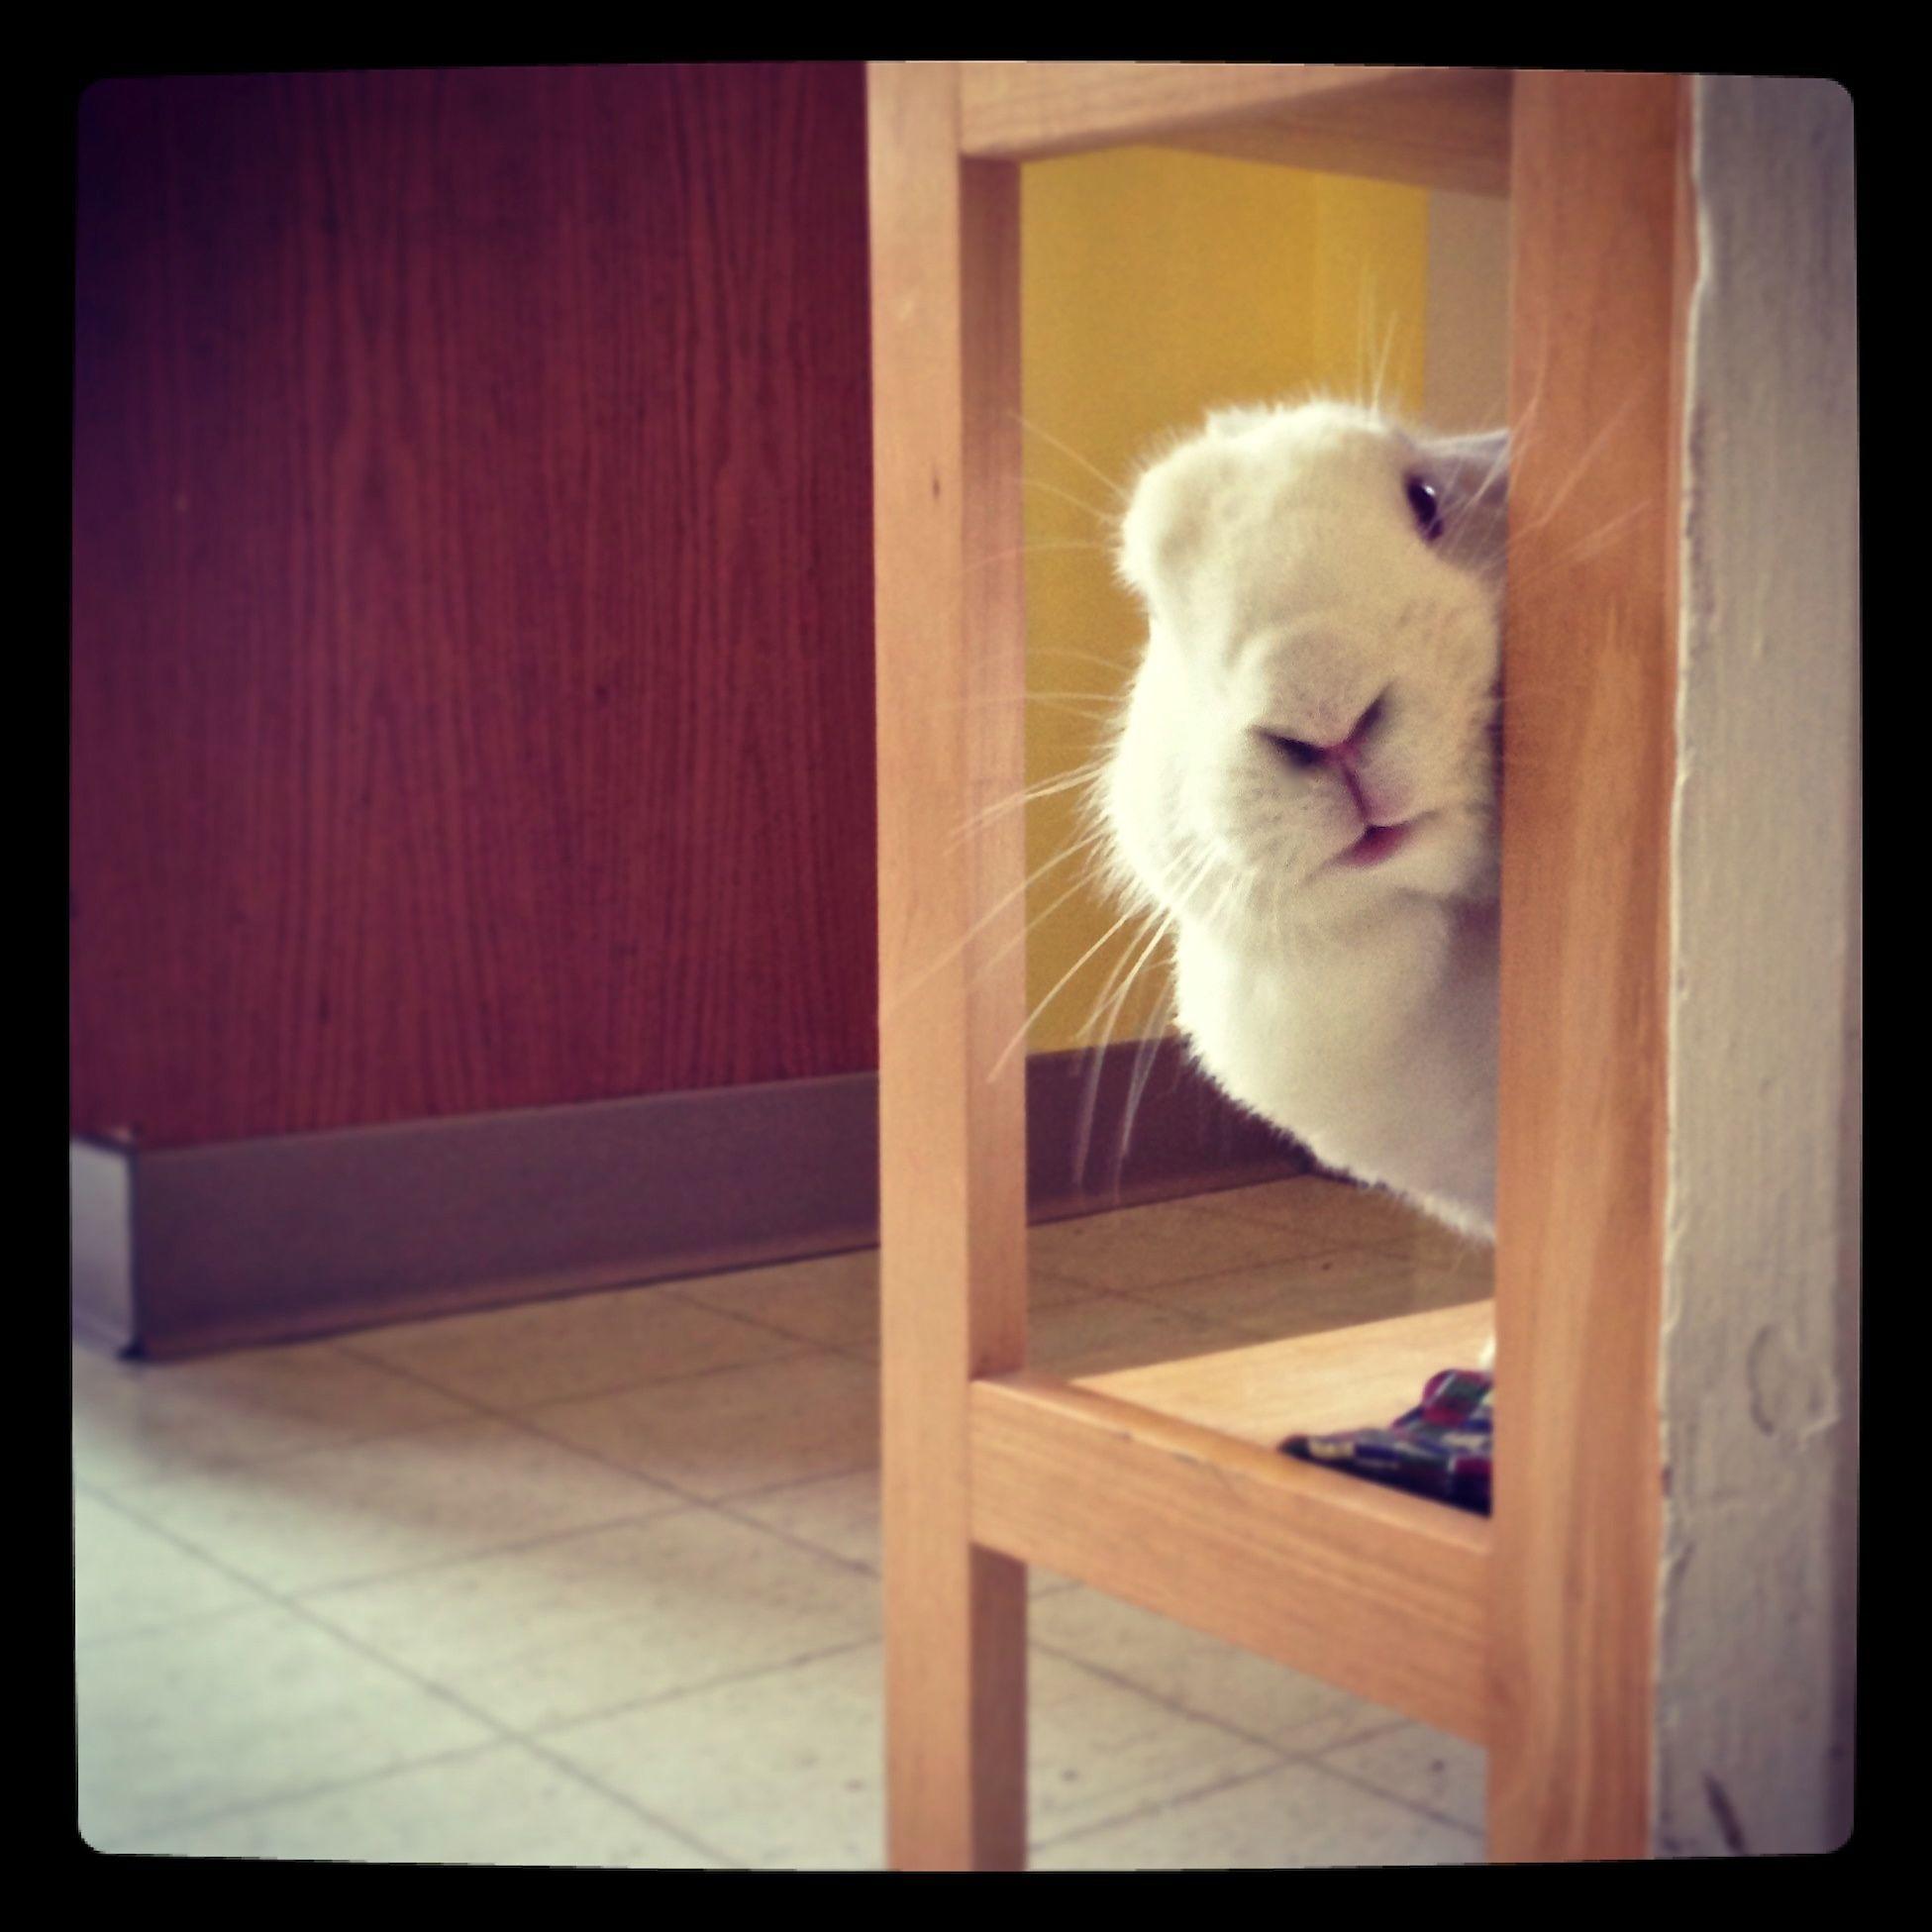 Bunny Pokes His Head Around the Corner to Say Hi